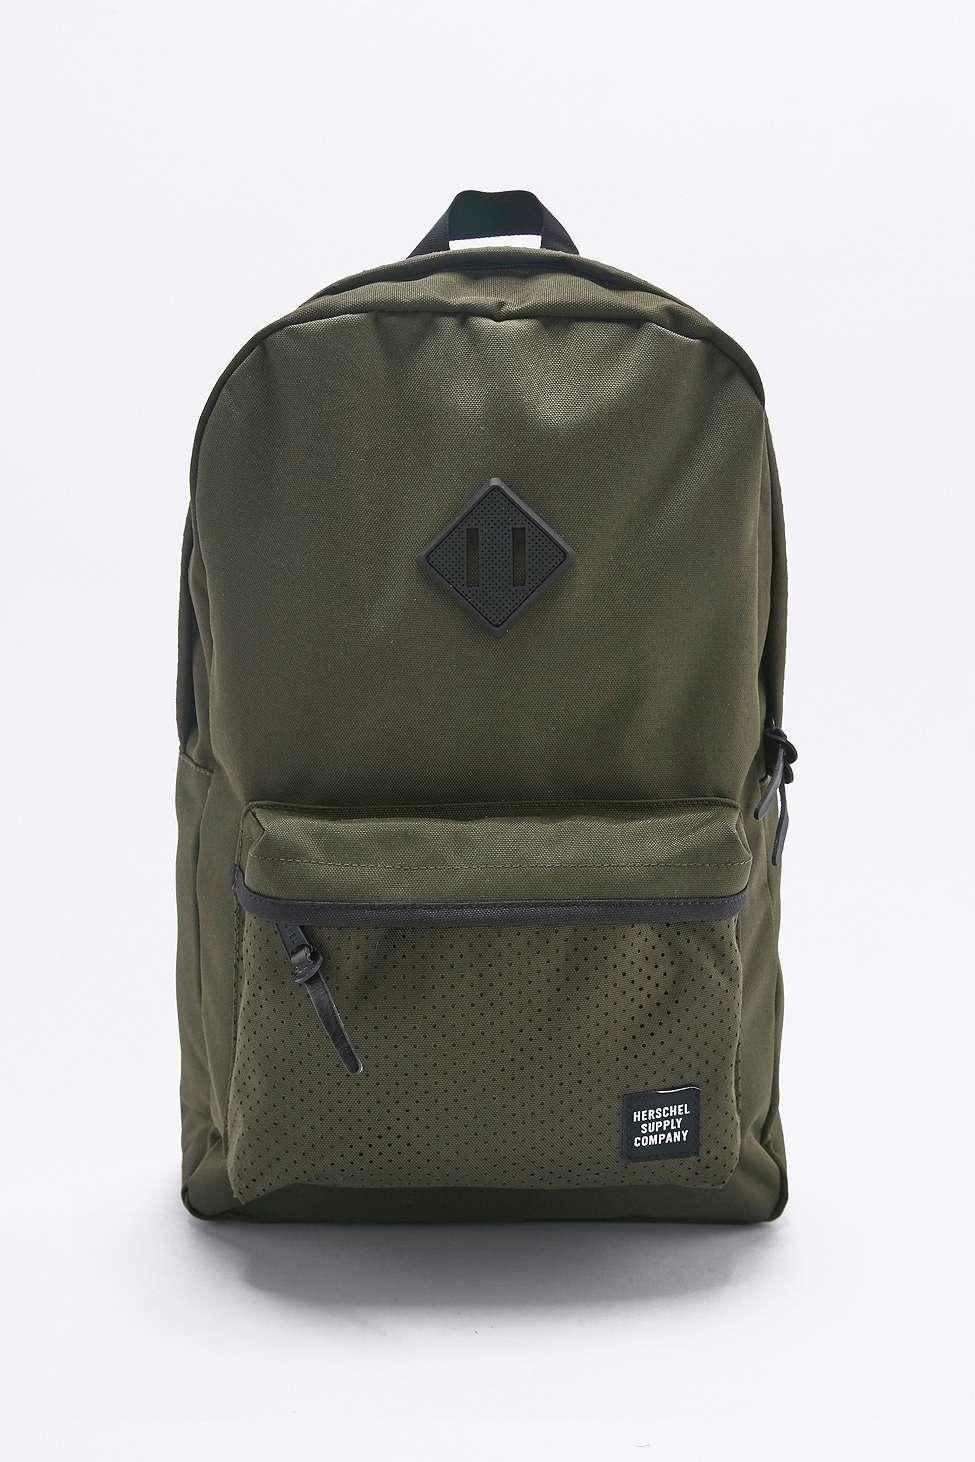 d148b7289f7 Herschel Supply Co. Aspect Heritage Khaki Canvas Backpack for Men - Lyst